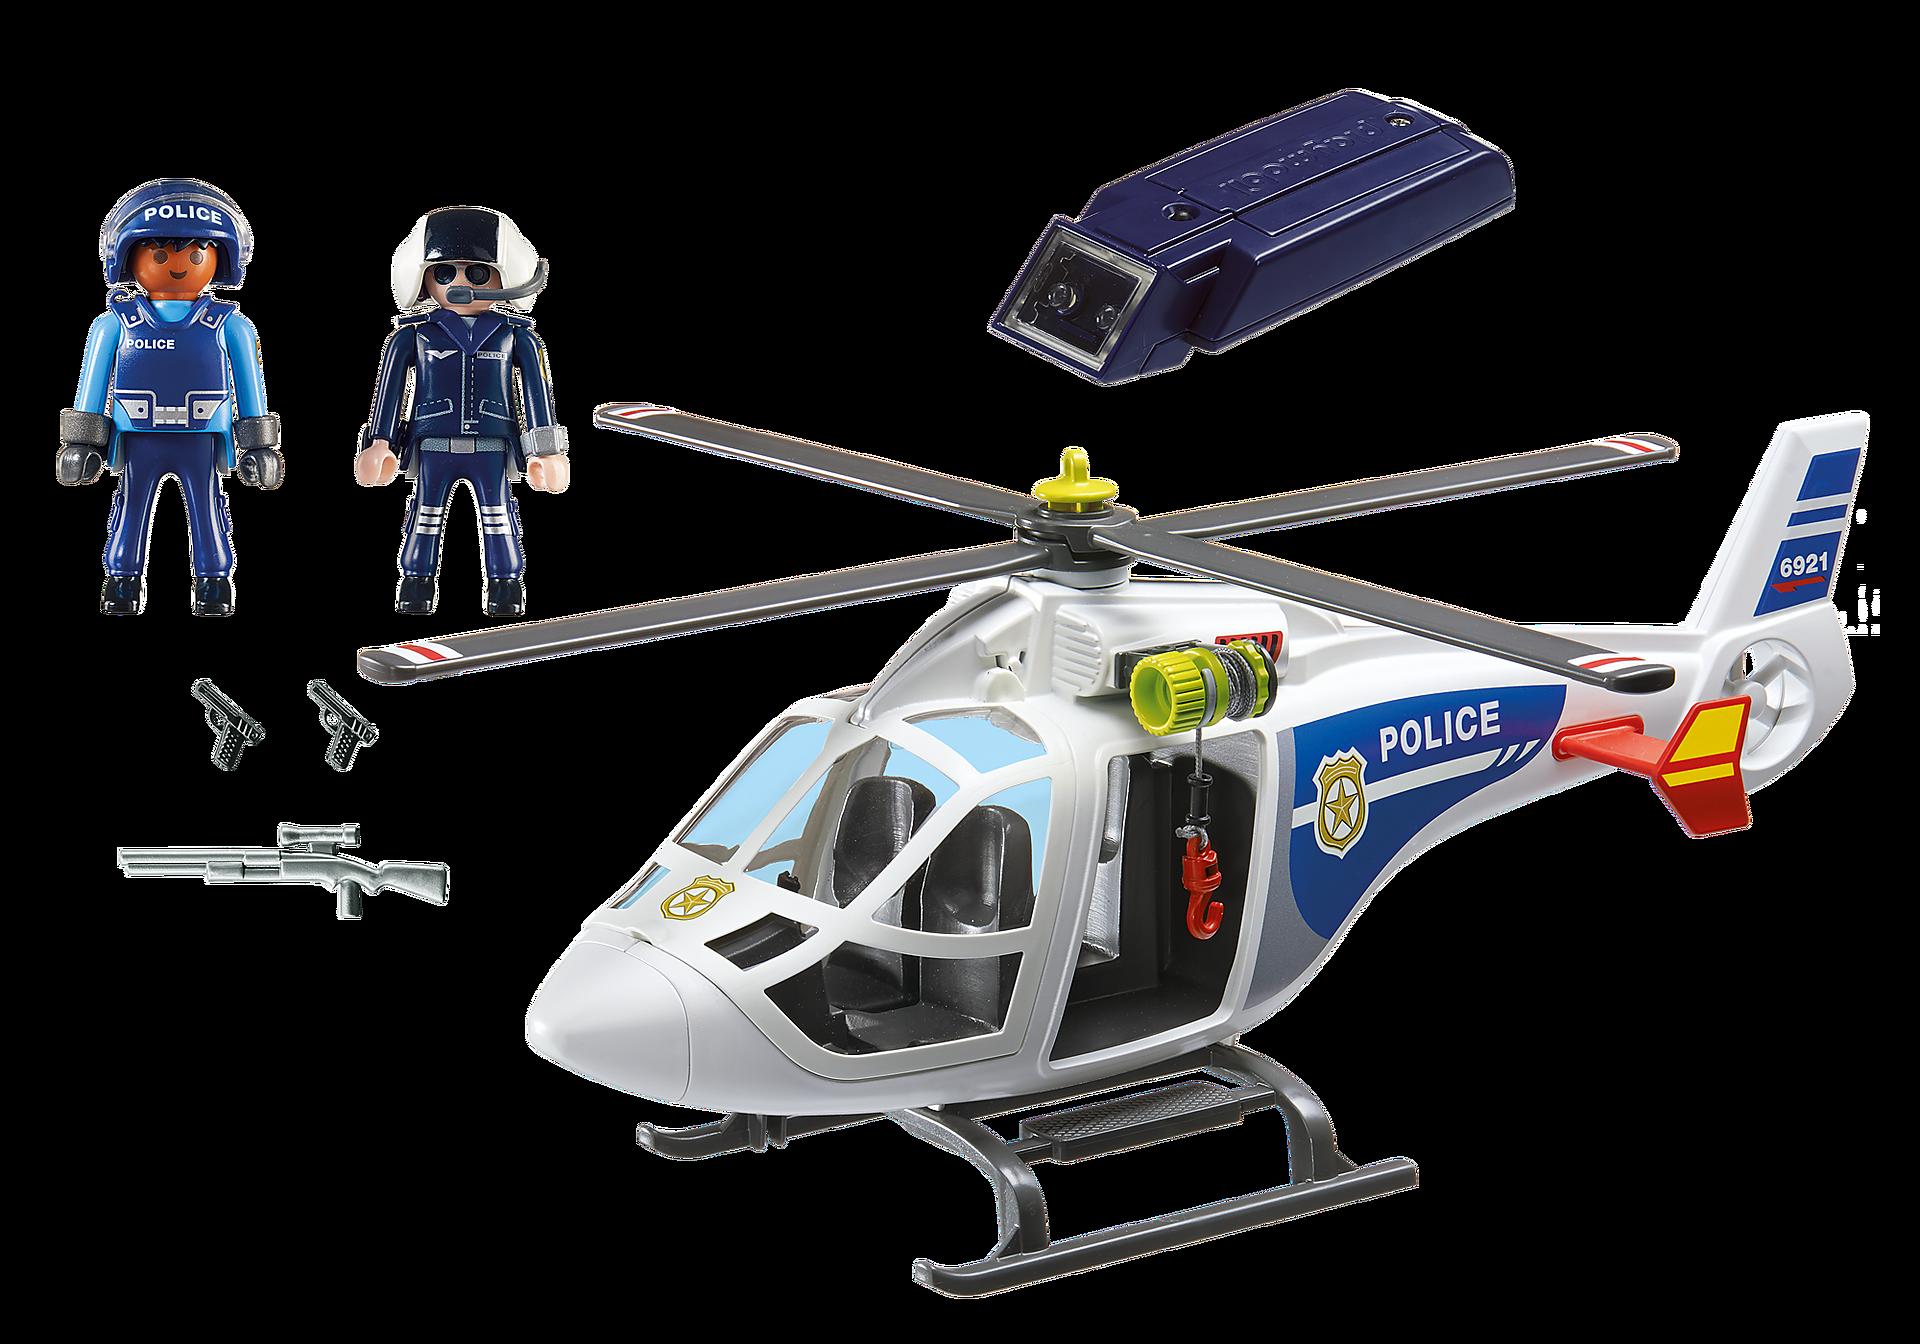 6921 Helicóptero de Policía con Luces LED zoom image3